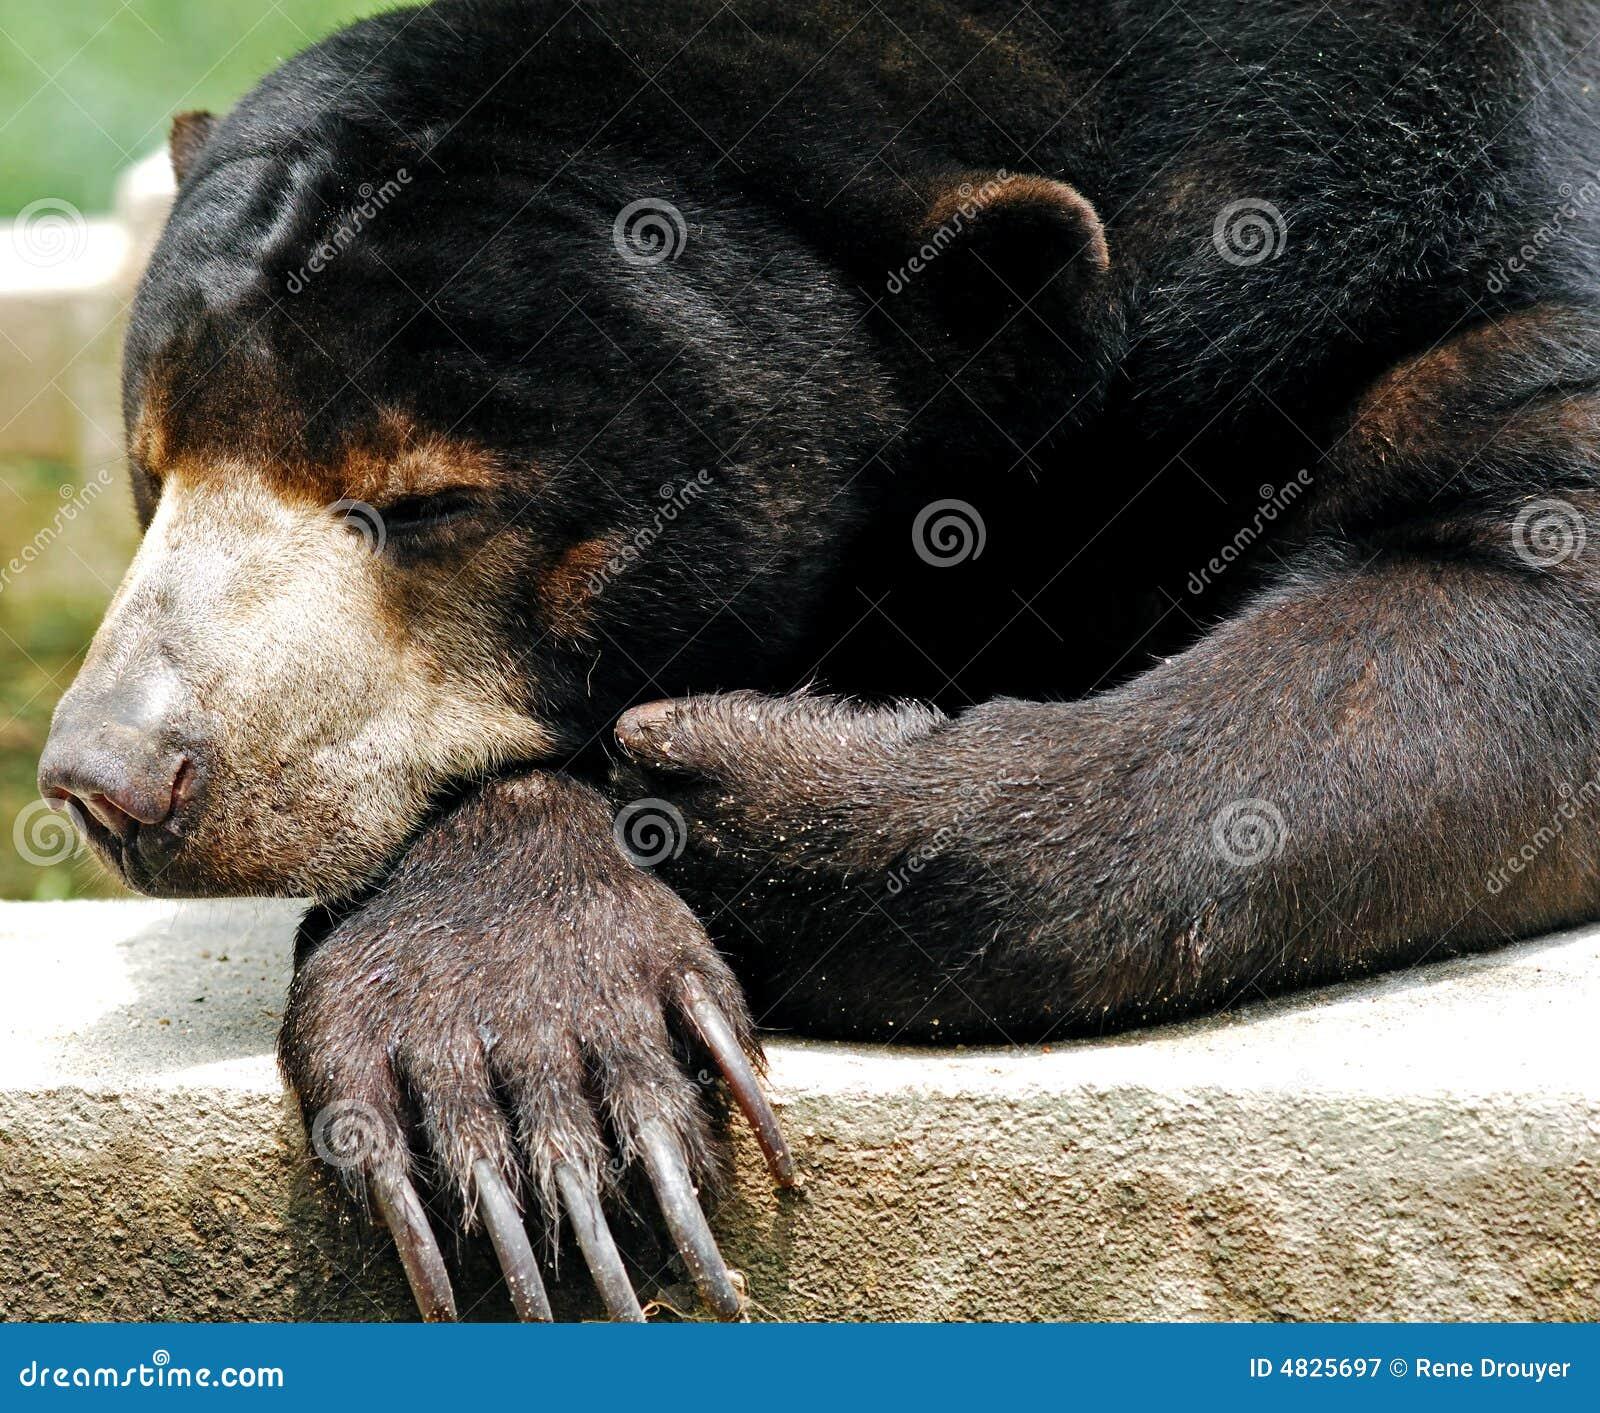 Malaysia, Penang: Asiatischer Bär